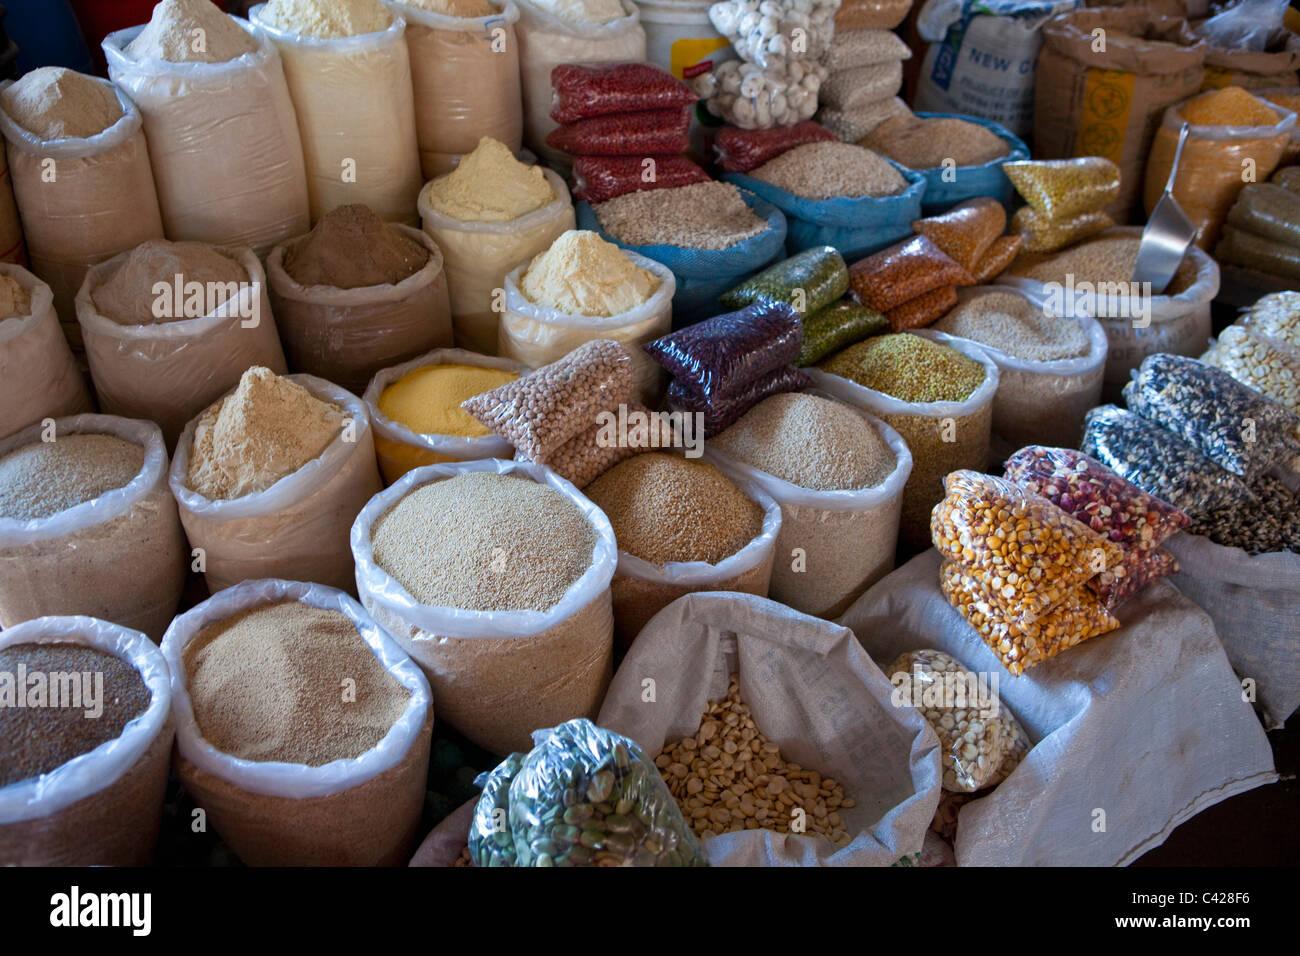 Peru, Cusco, Cuzco. Market, selling cereals, beans, etc. - Stock Image